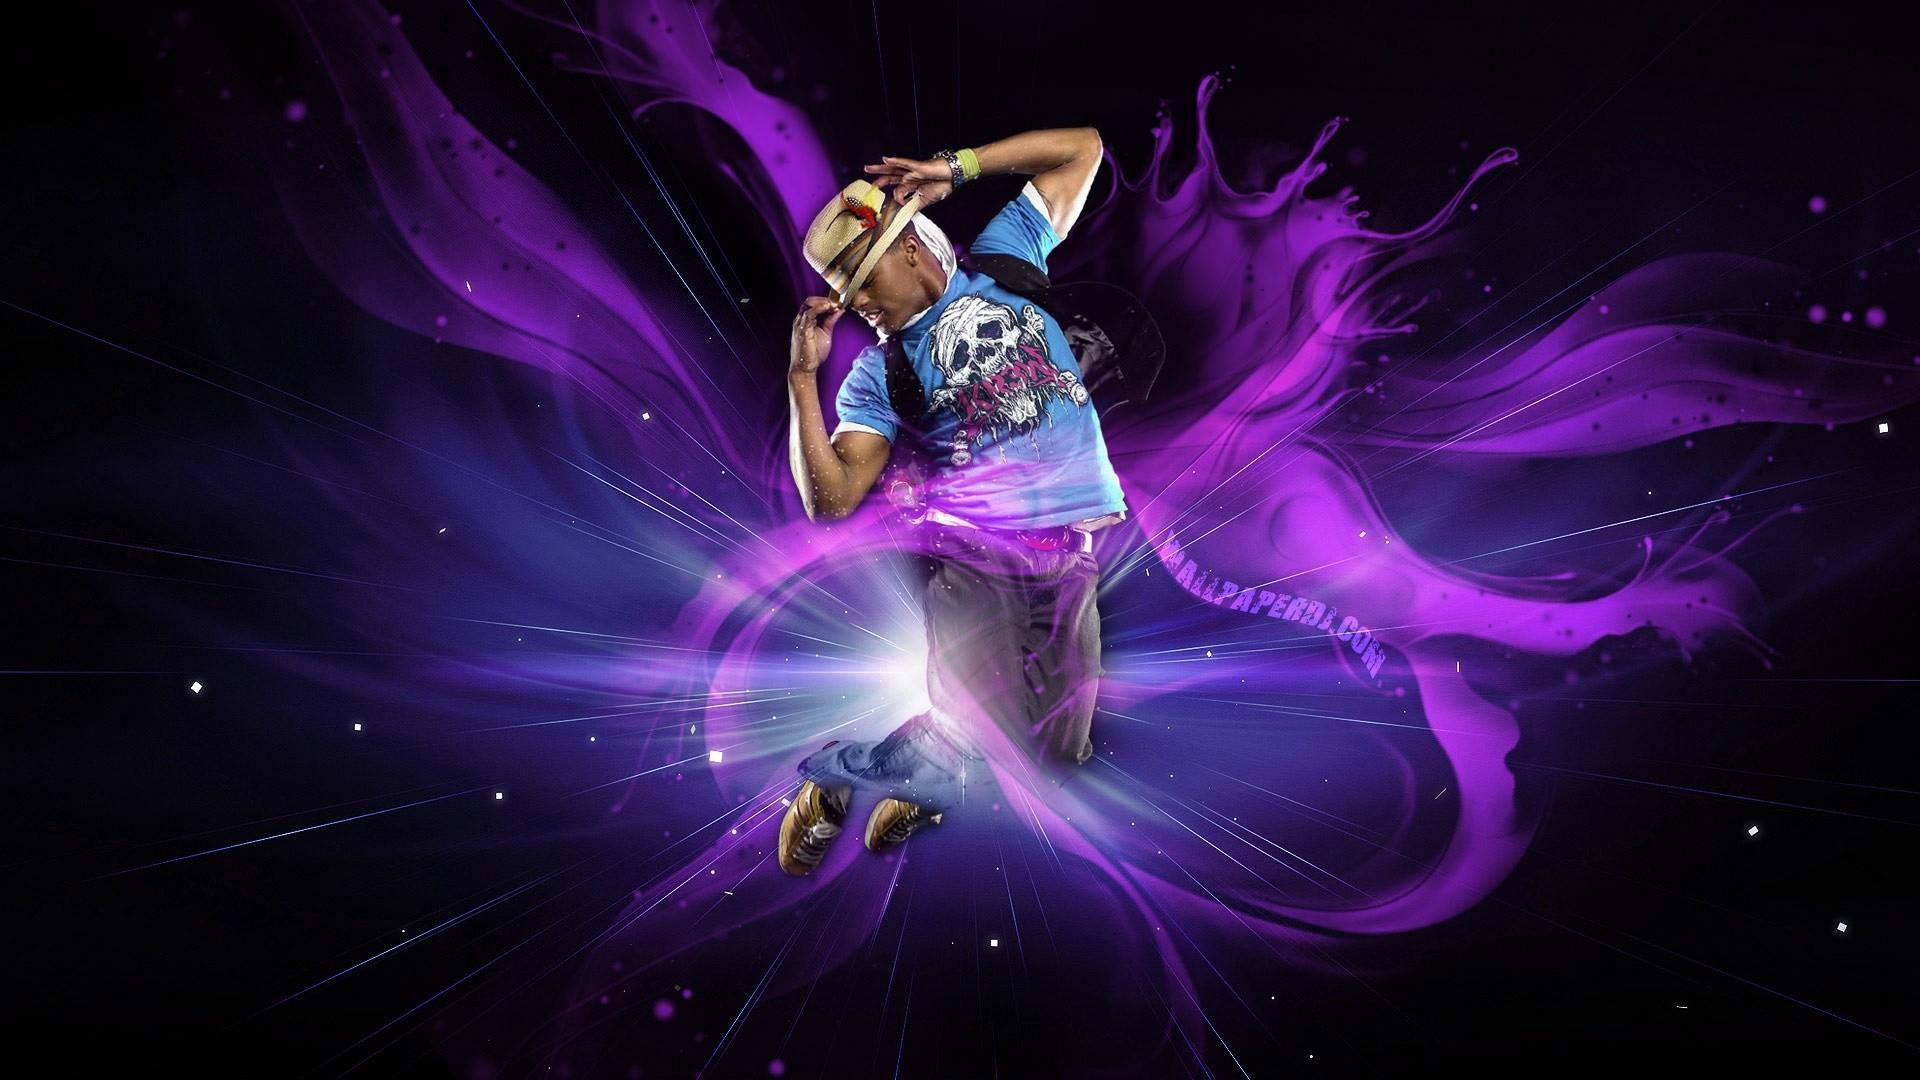 Cool Dance Backgrounds (64+ images) | 1920 x 1080 jpeg 311kB